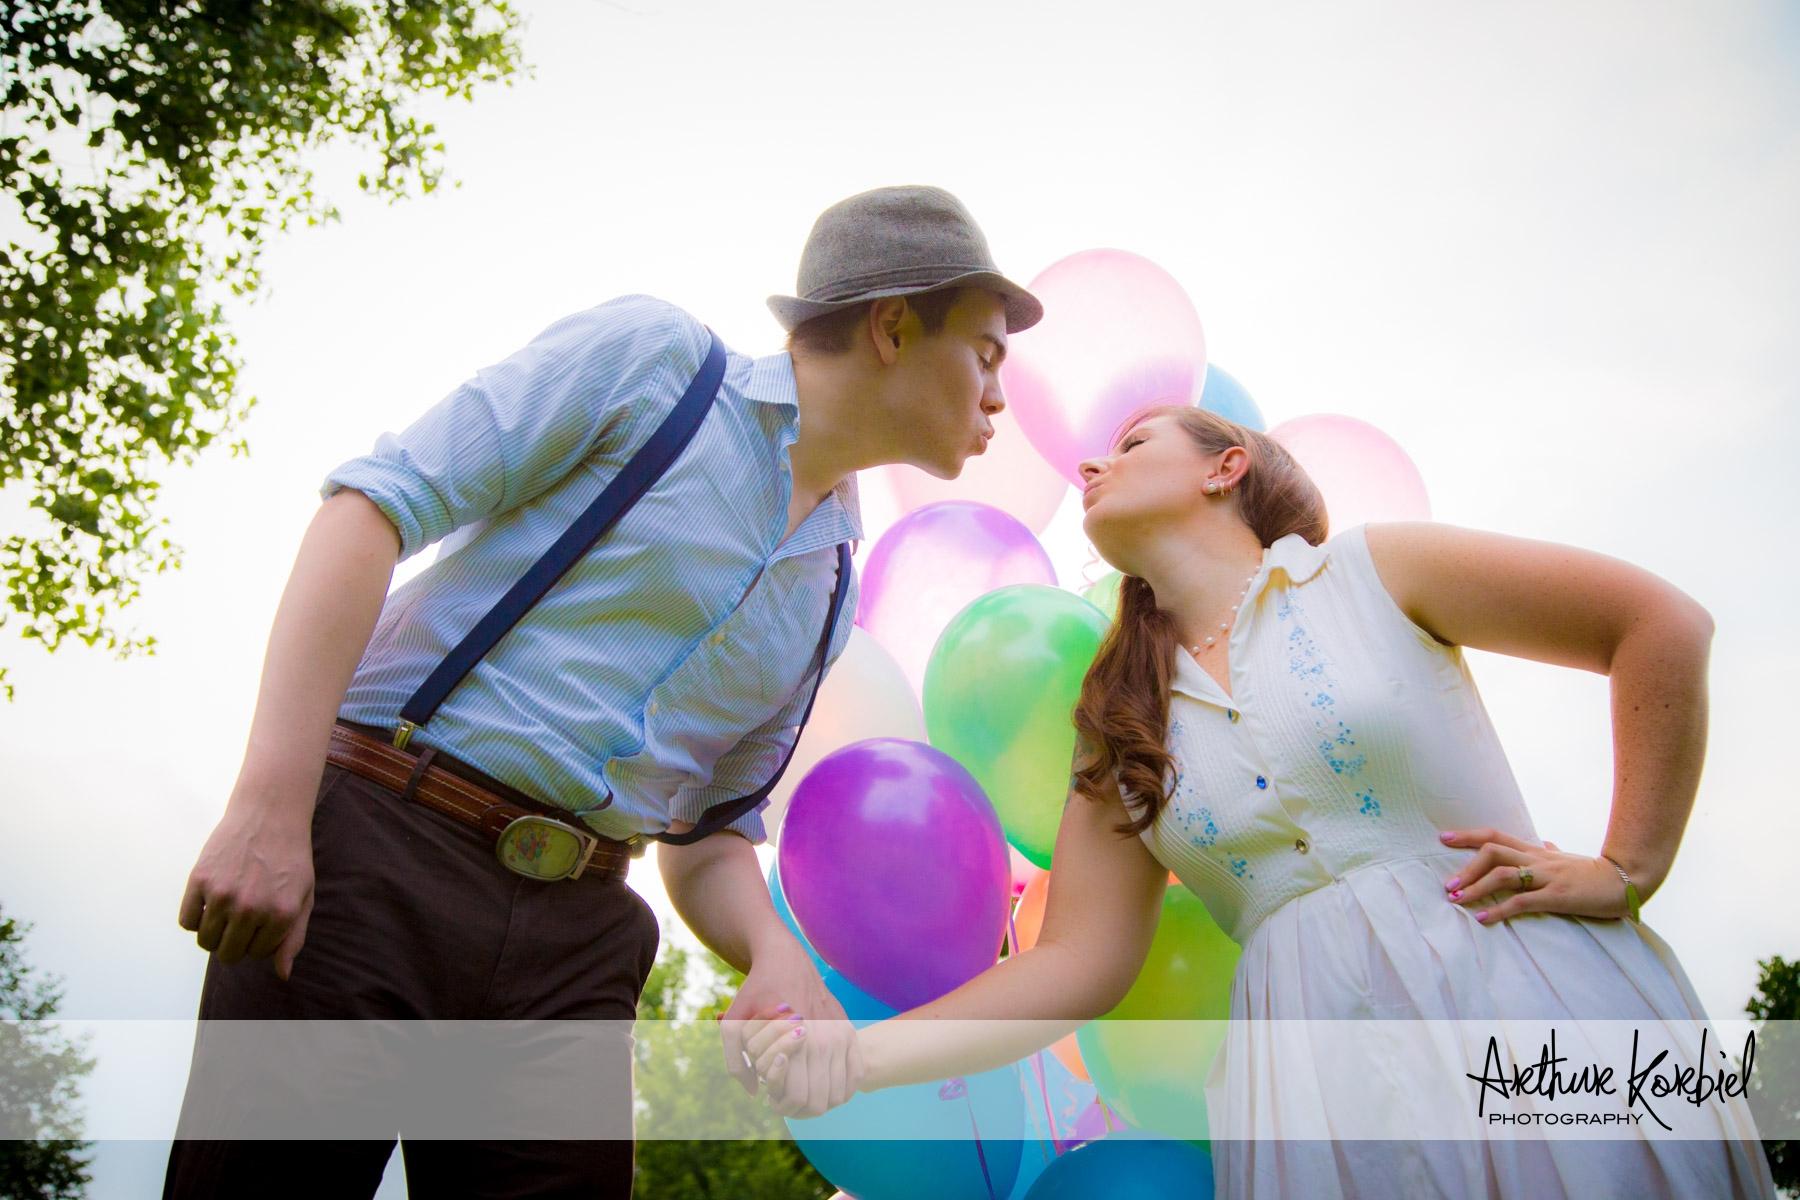 Arthur Korbiel Photography - London Engagement Photographer - Erin &Cameron-018.jpg